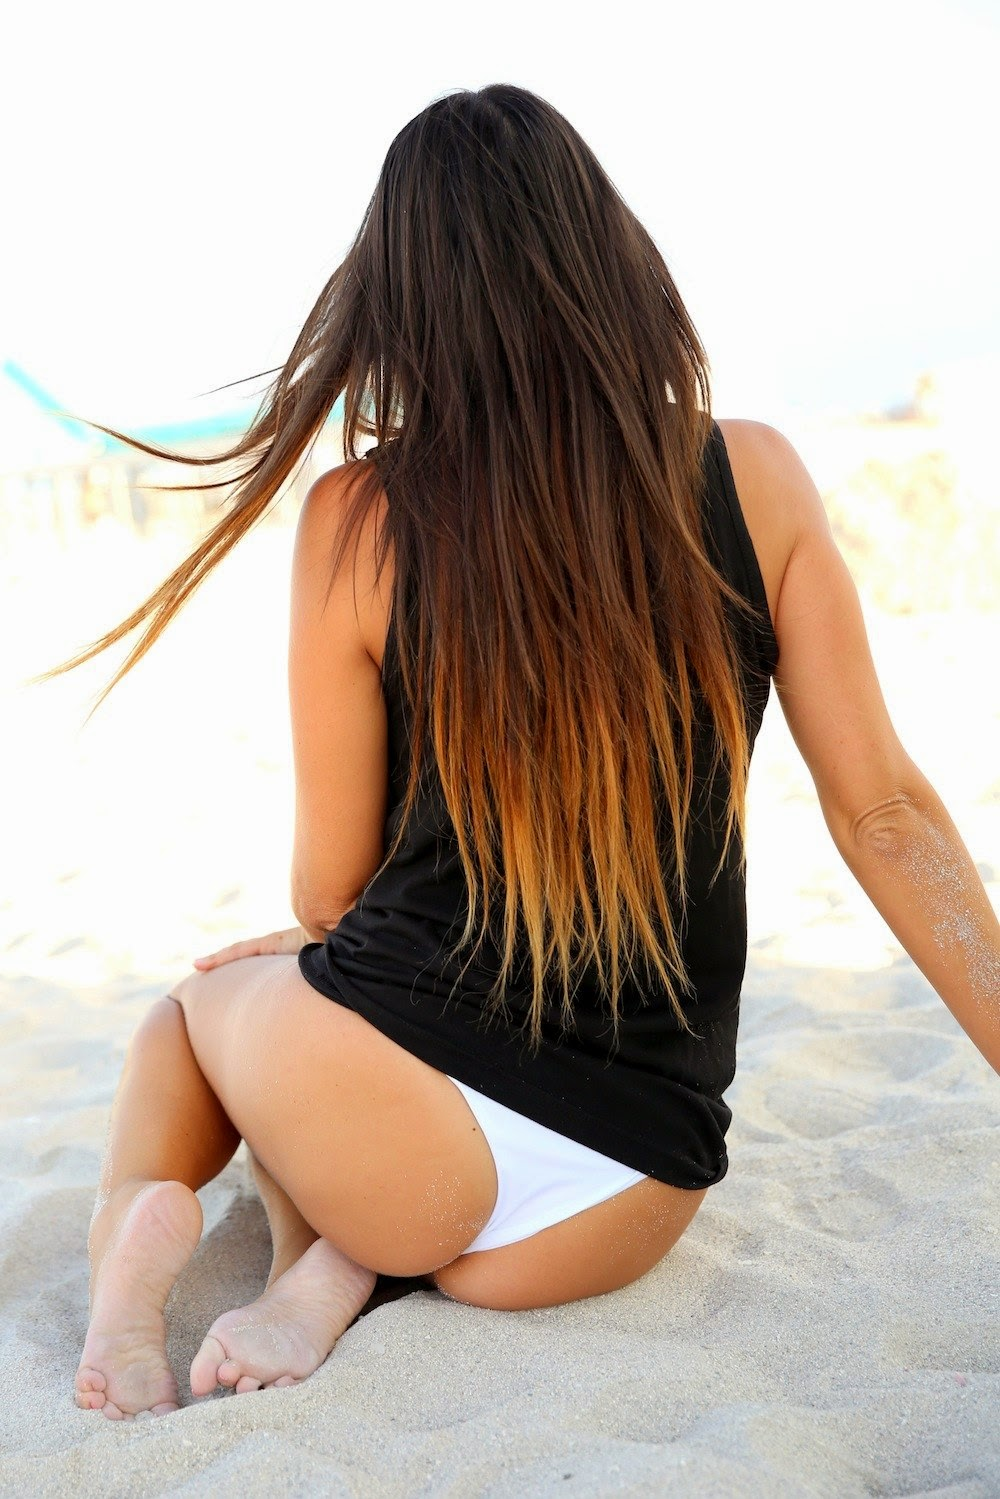 Claudia Romani Hot Bikini HQ Photoshoot